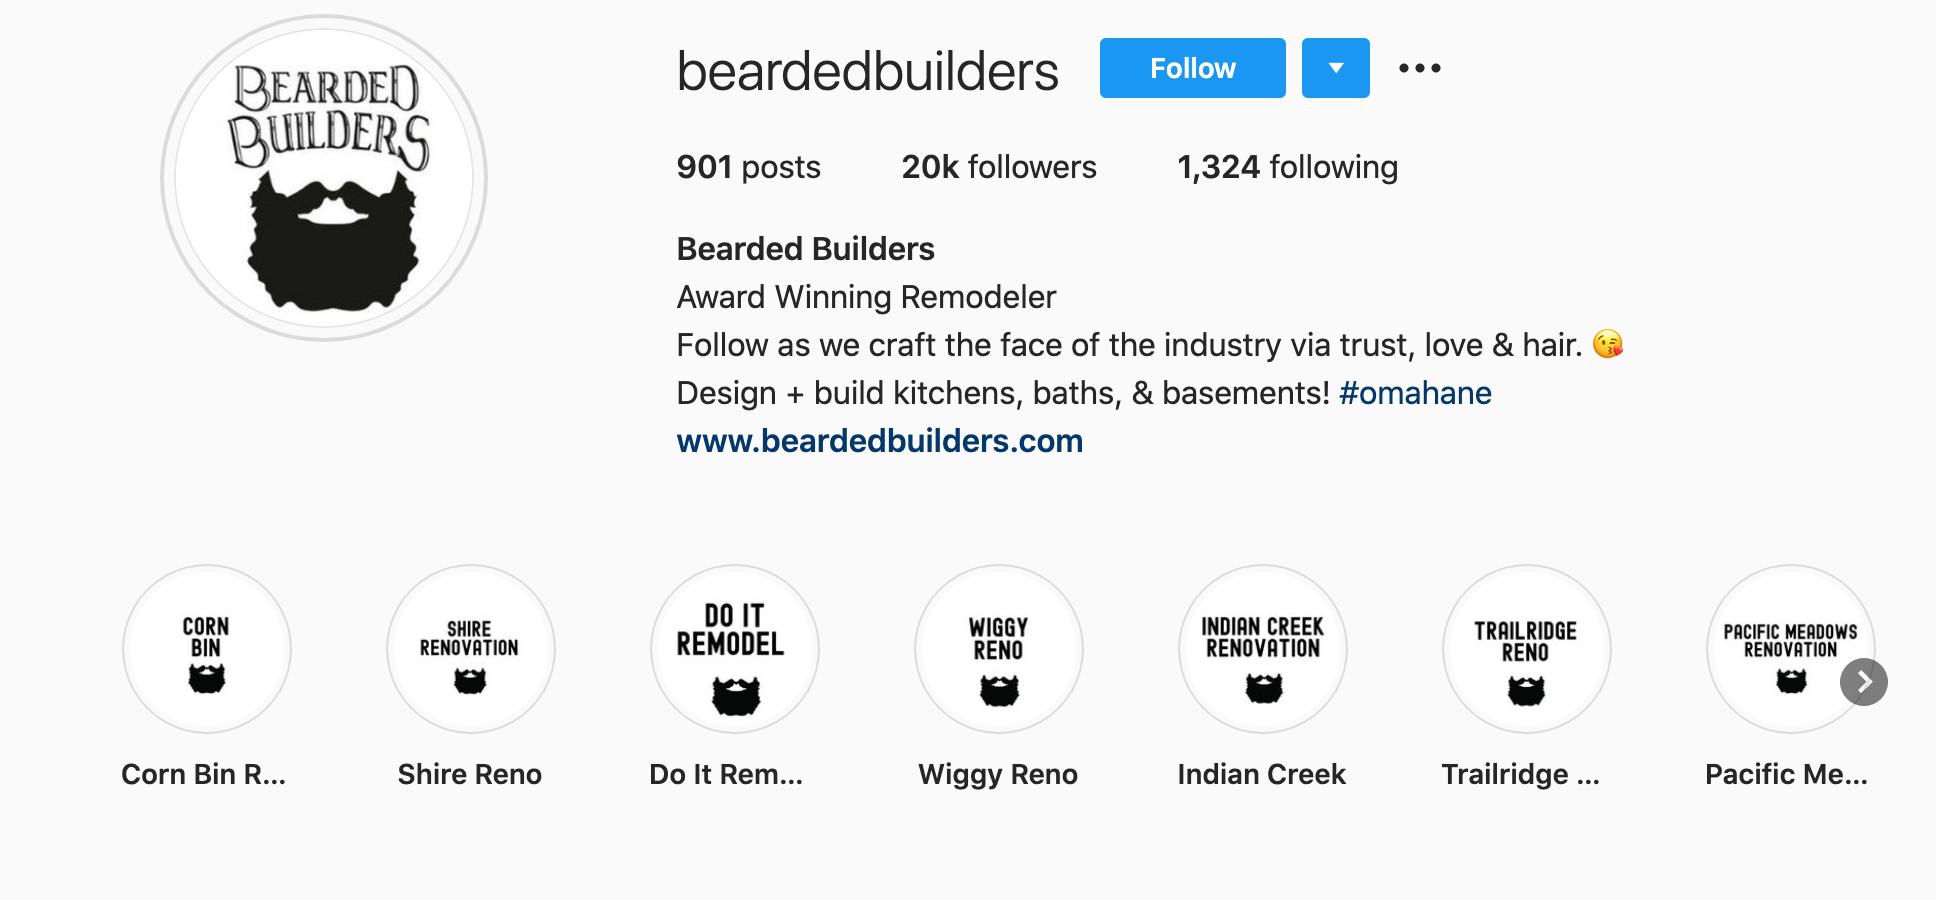 bearded-builders-remodeler-beardedbuilders-instagram-profile